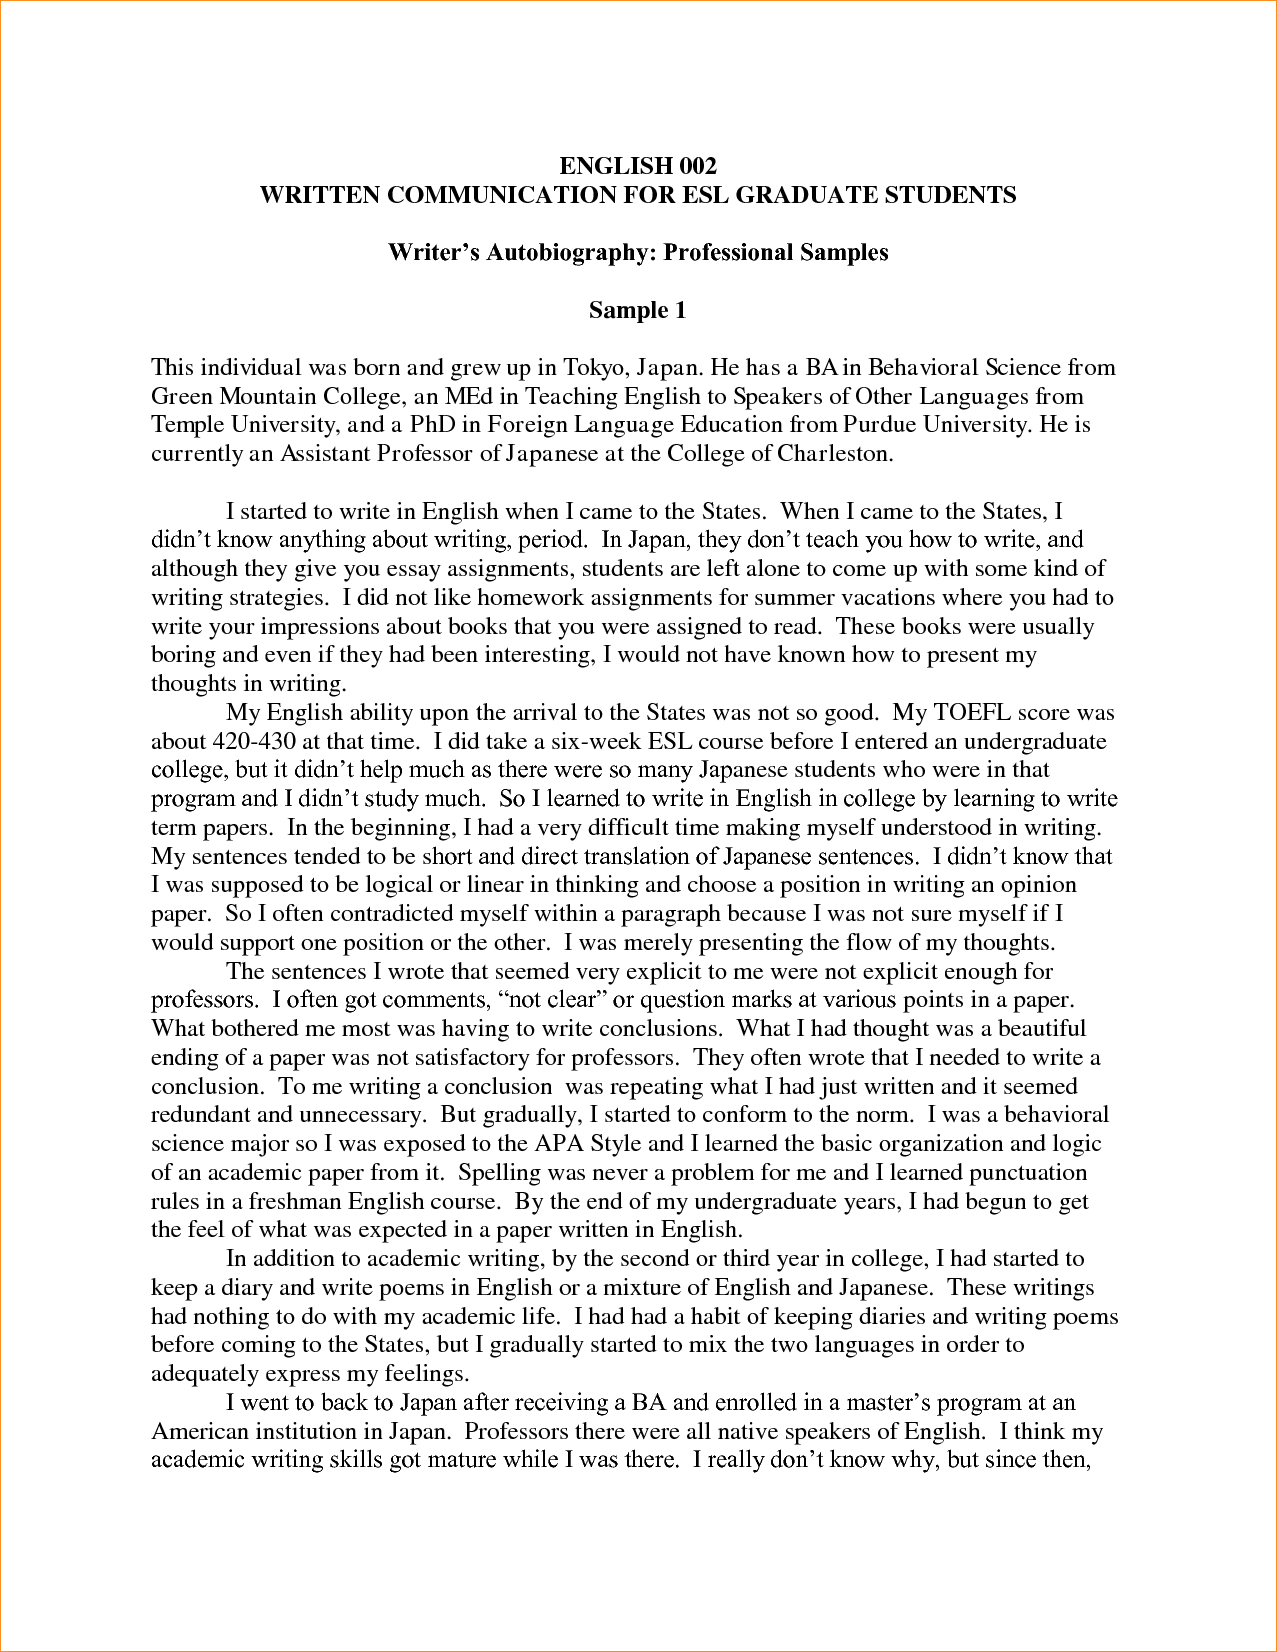 Public international law dissertation